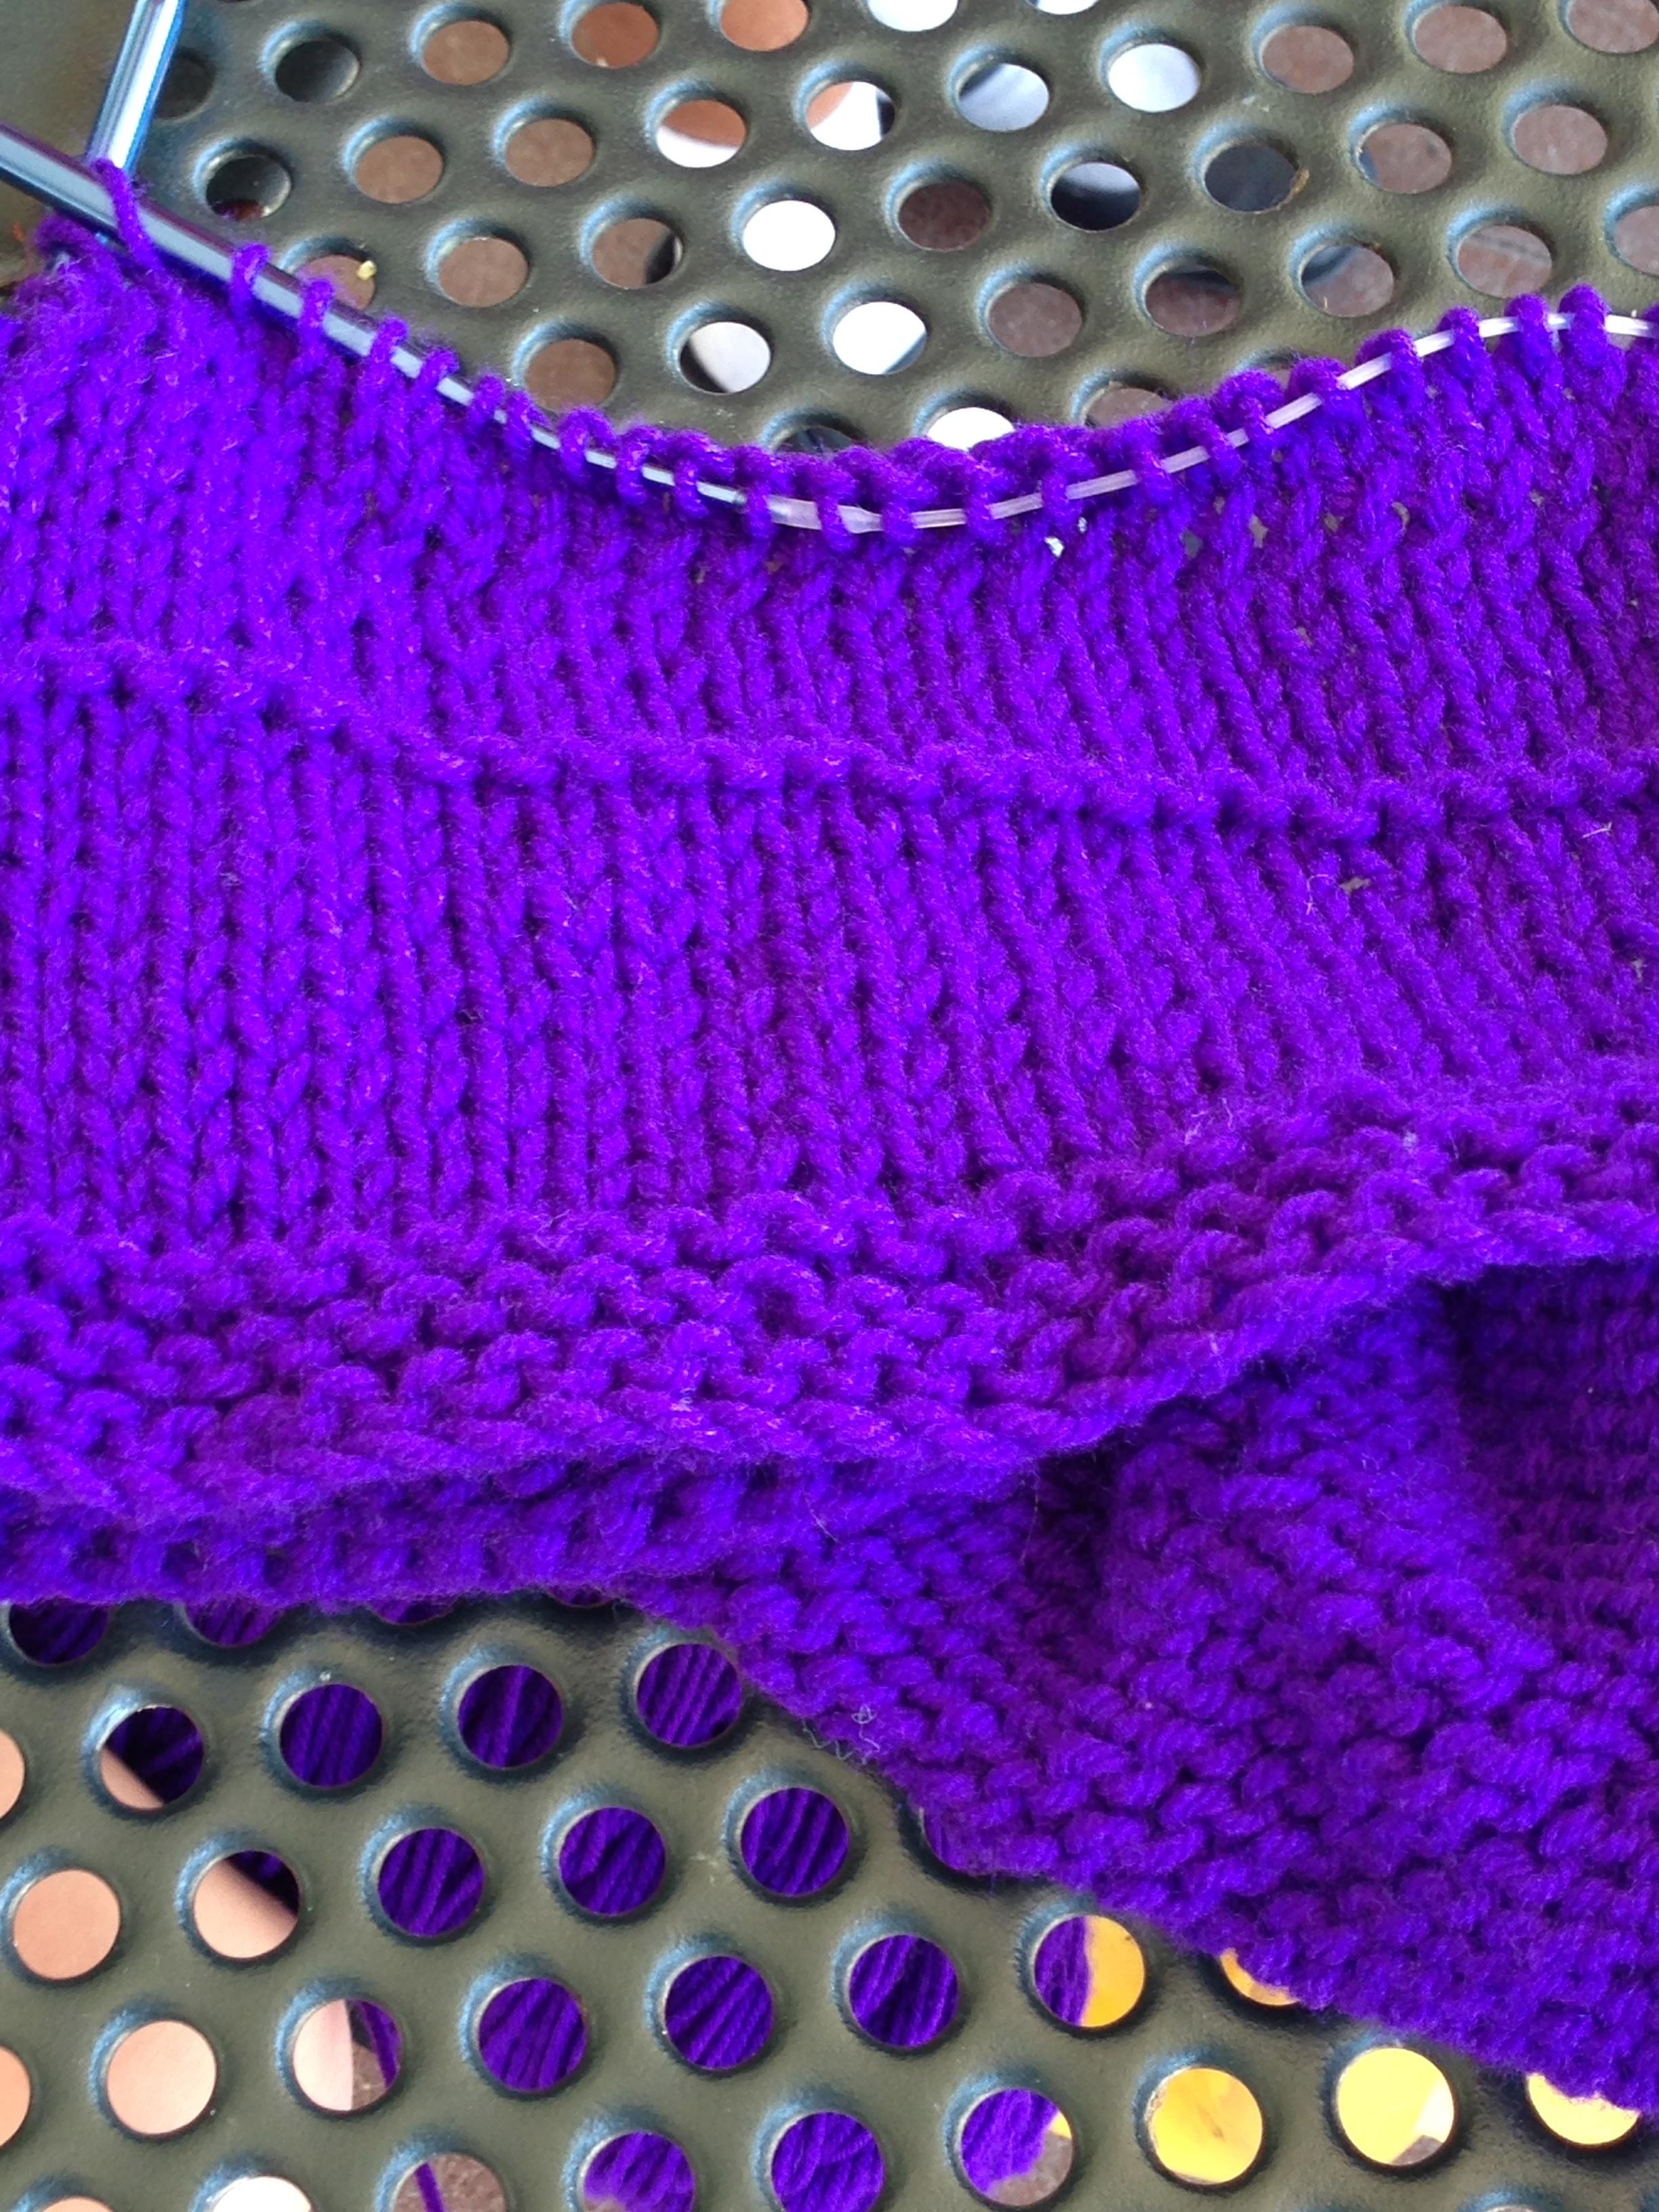 3rd grader knitting on circular needles - more than 100 stitches!!